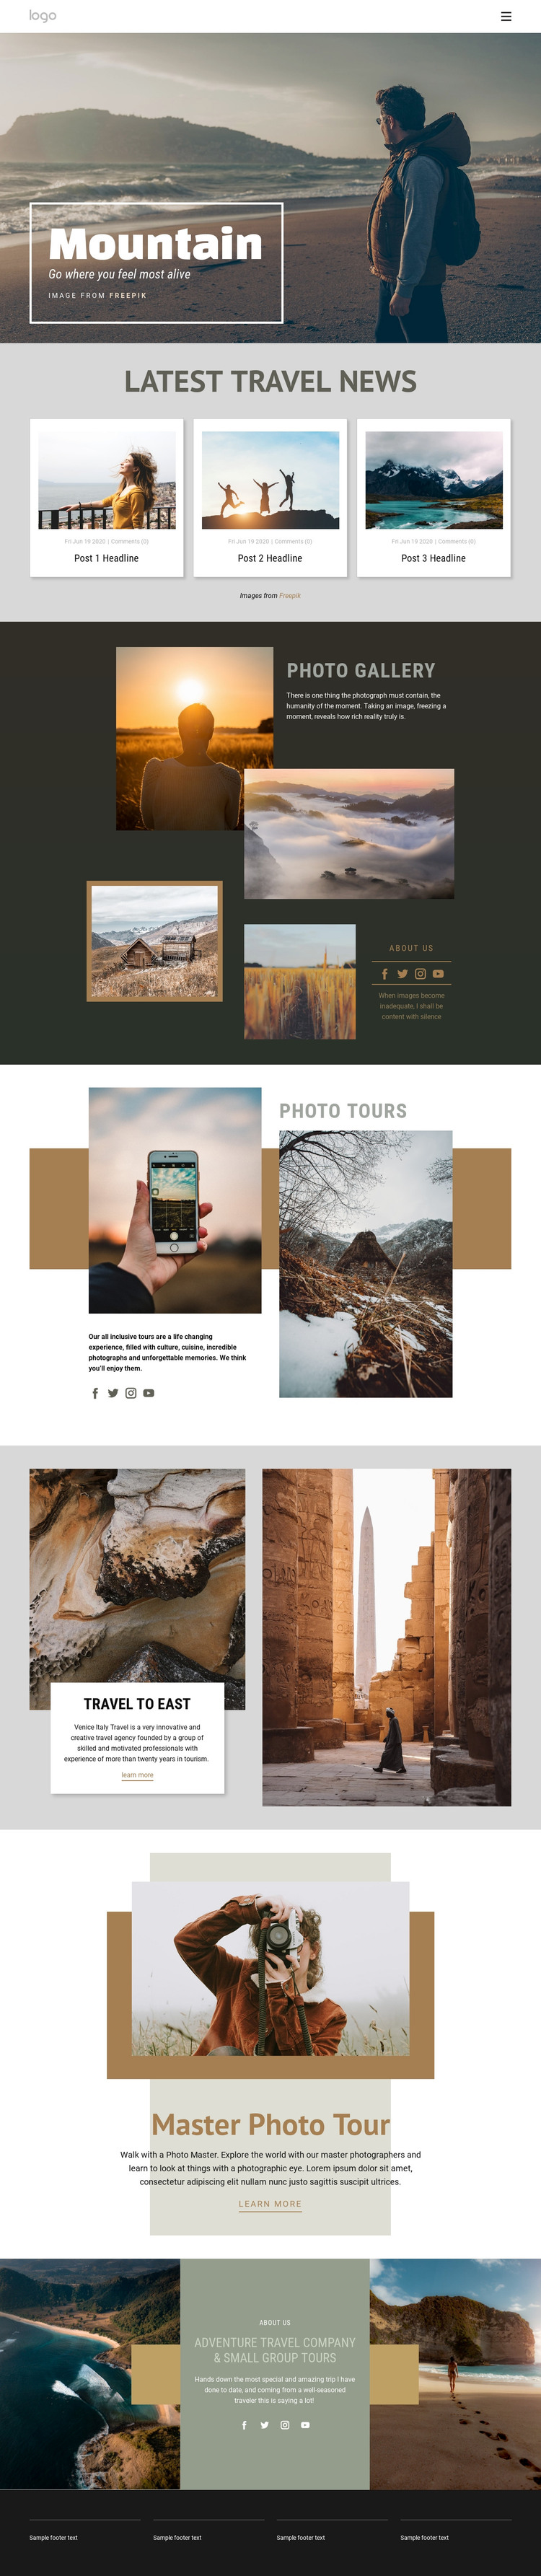 Mountain advanture travel WordPress Theme